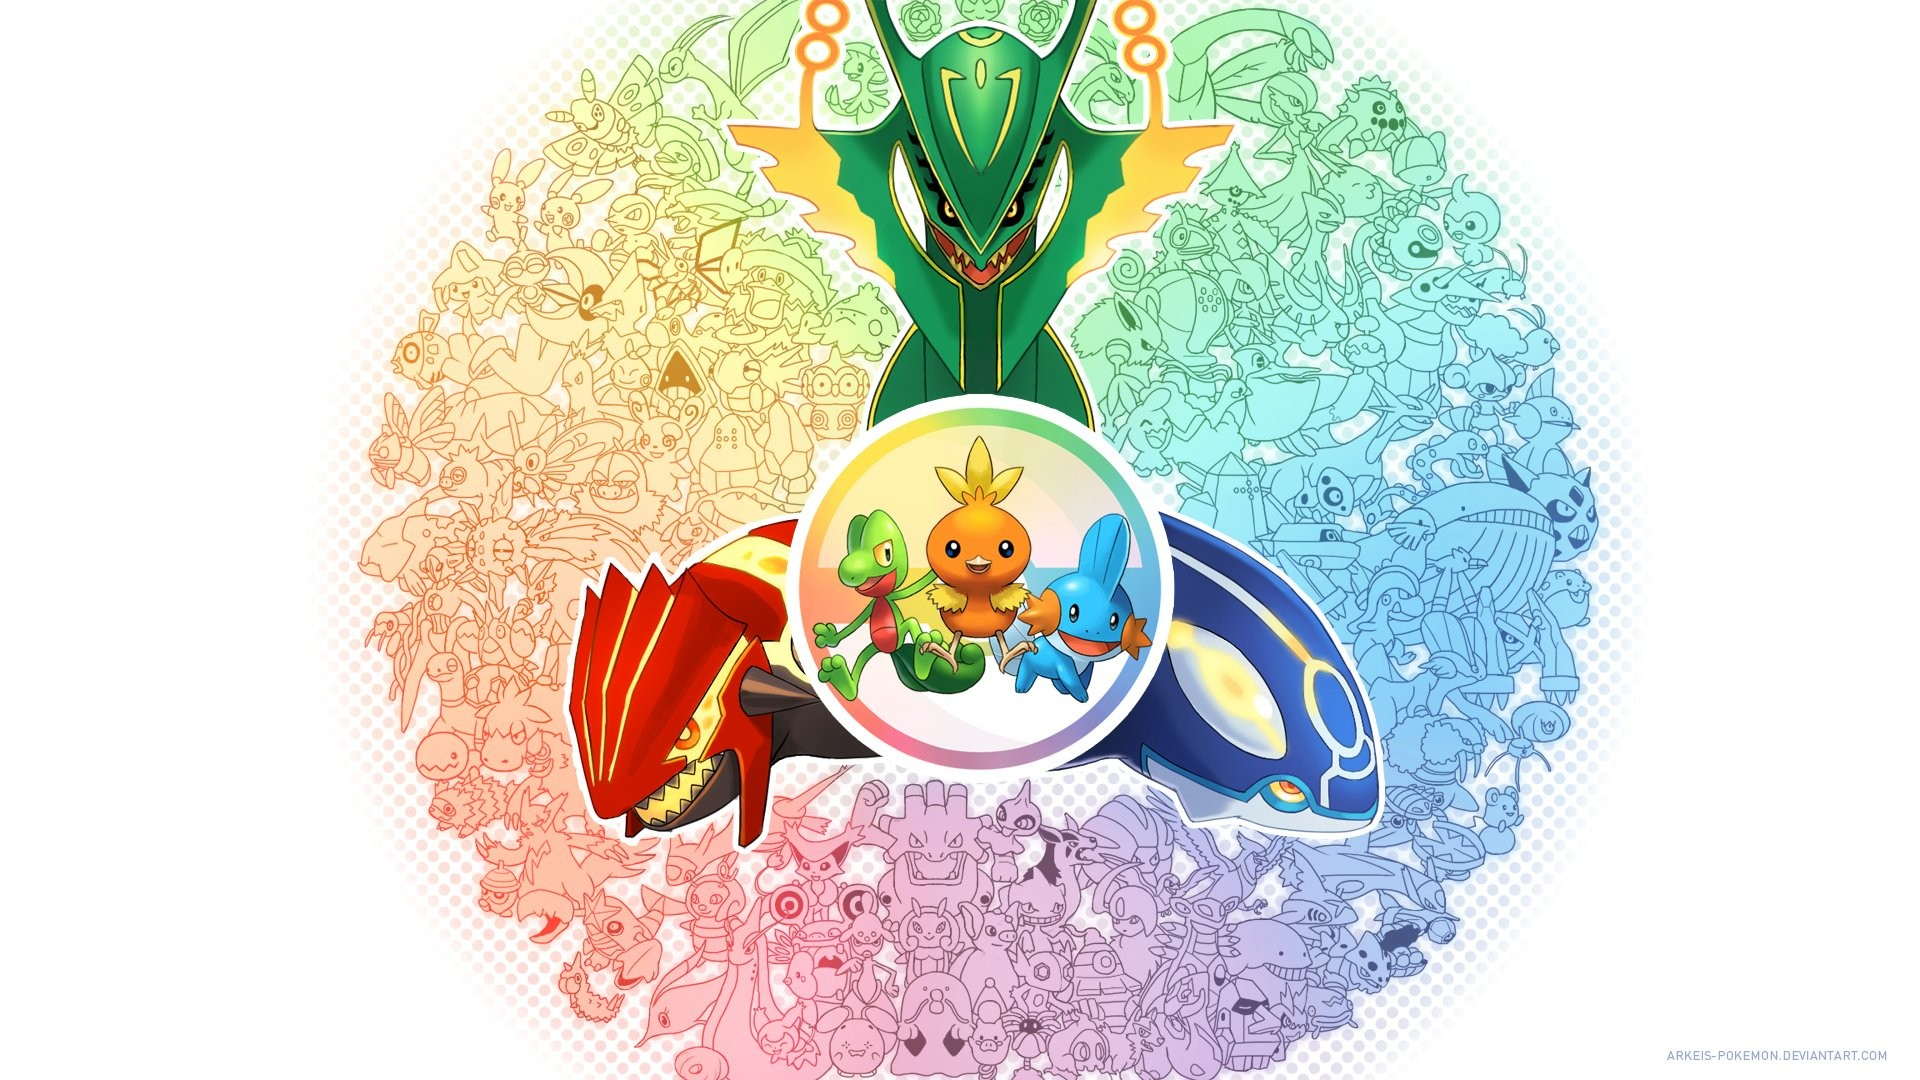 940810 Pokemon Kyogre Groudon Rayquaza